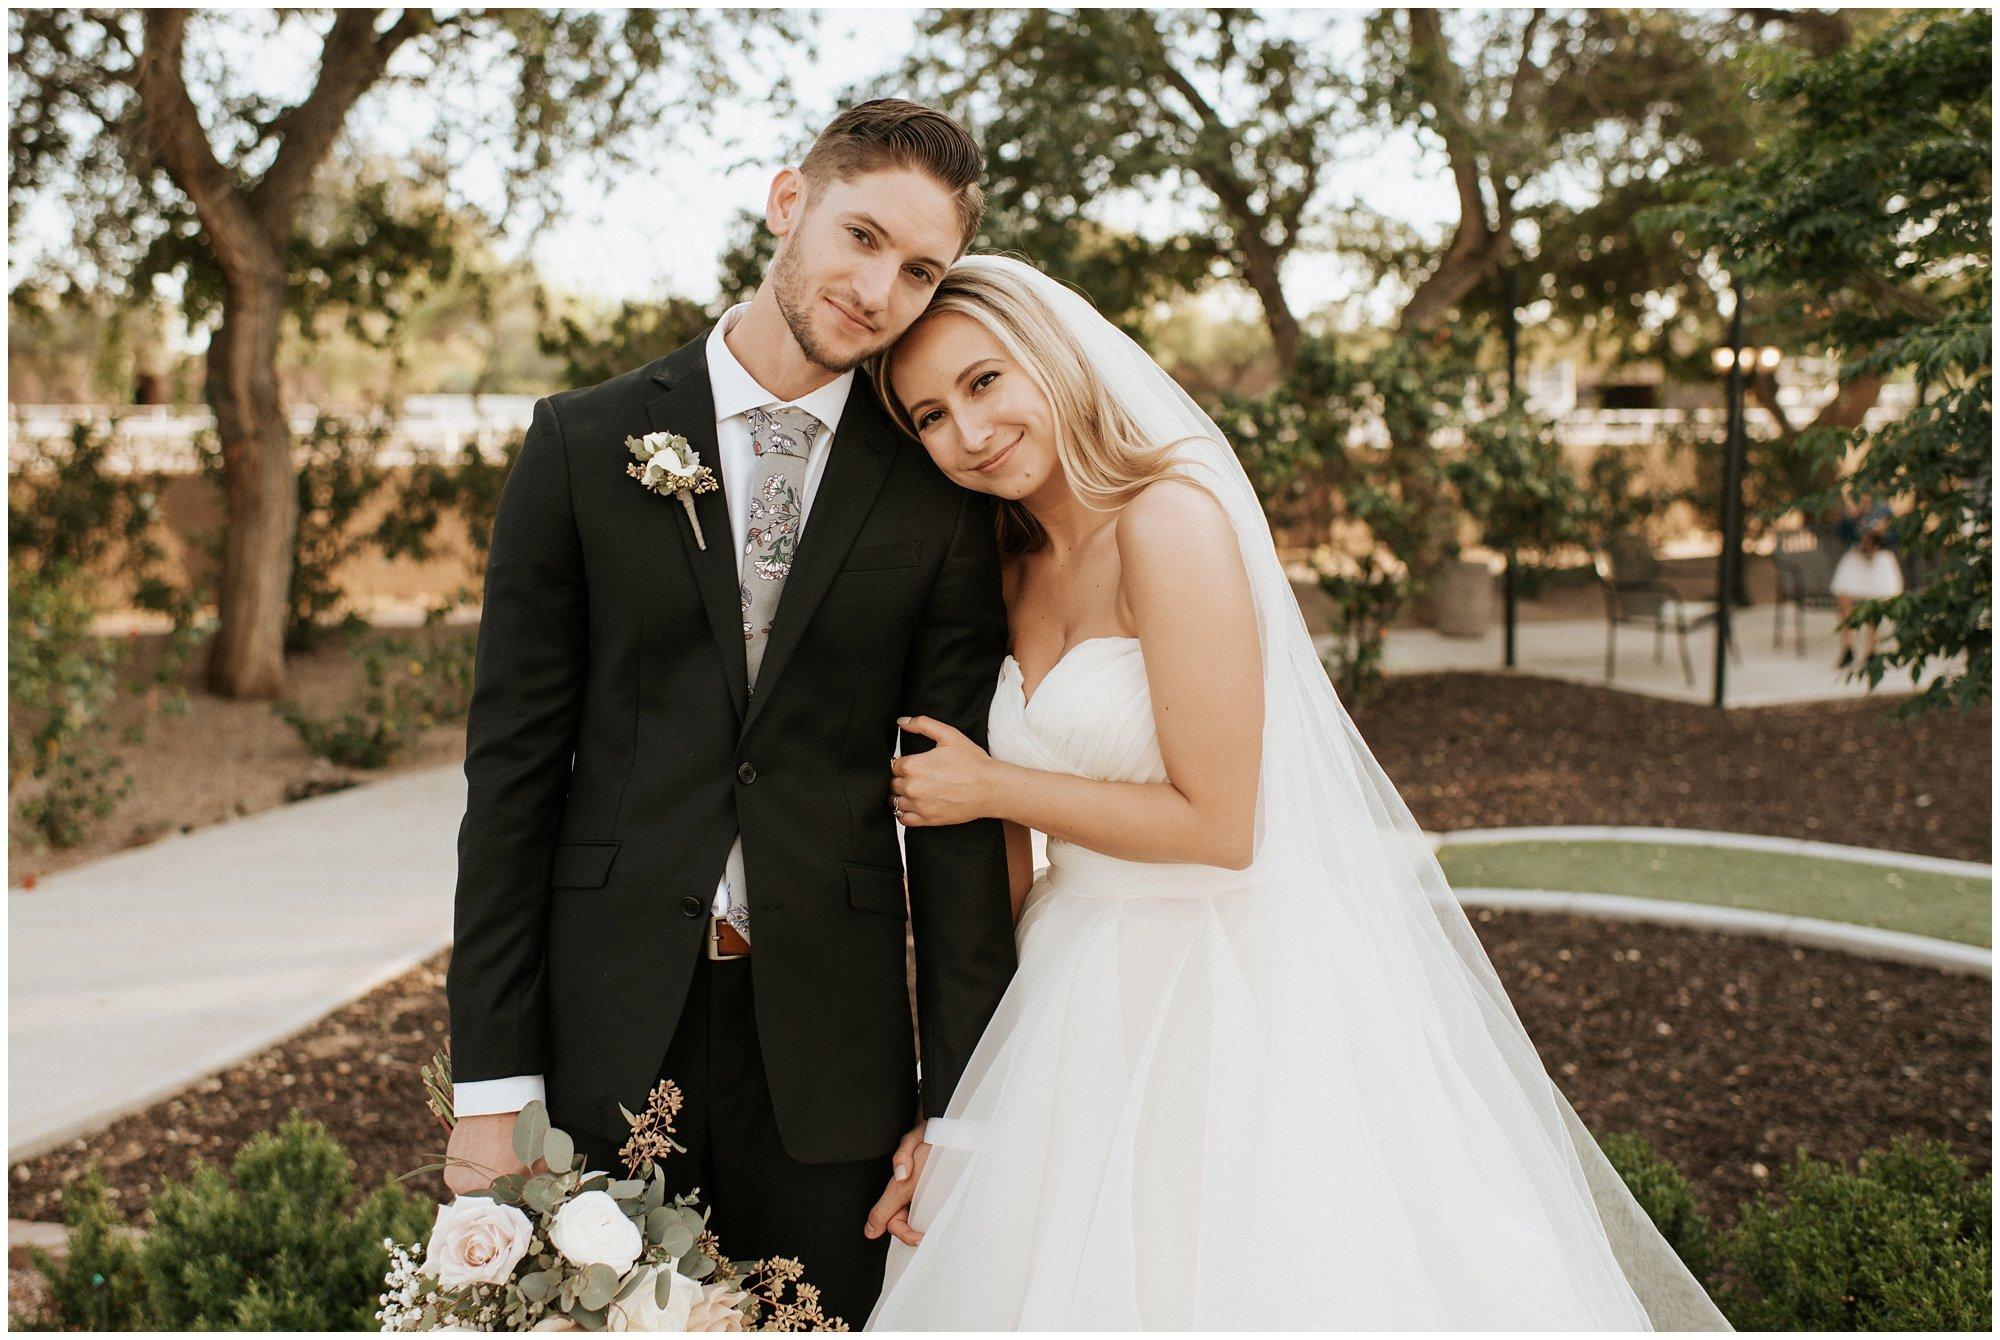 Wedgewood_Lindsay_Groves-Arizona-Wedding-Photographer-M+C_0042.jpg